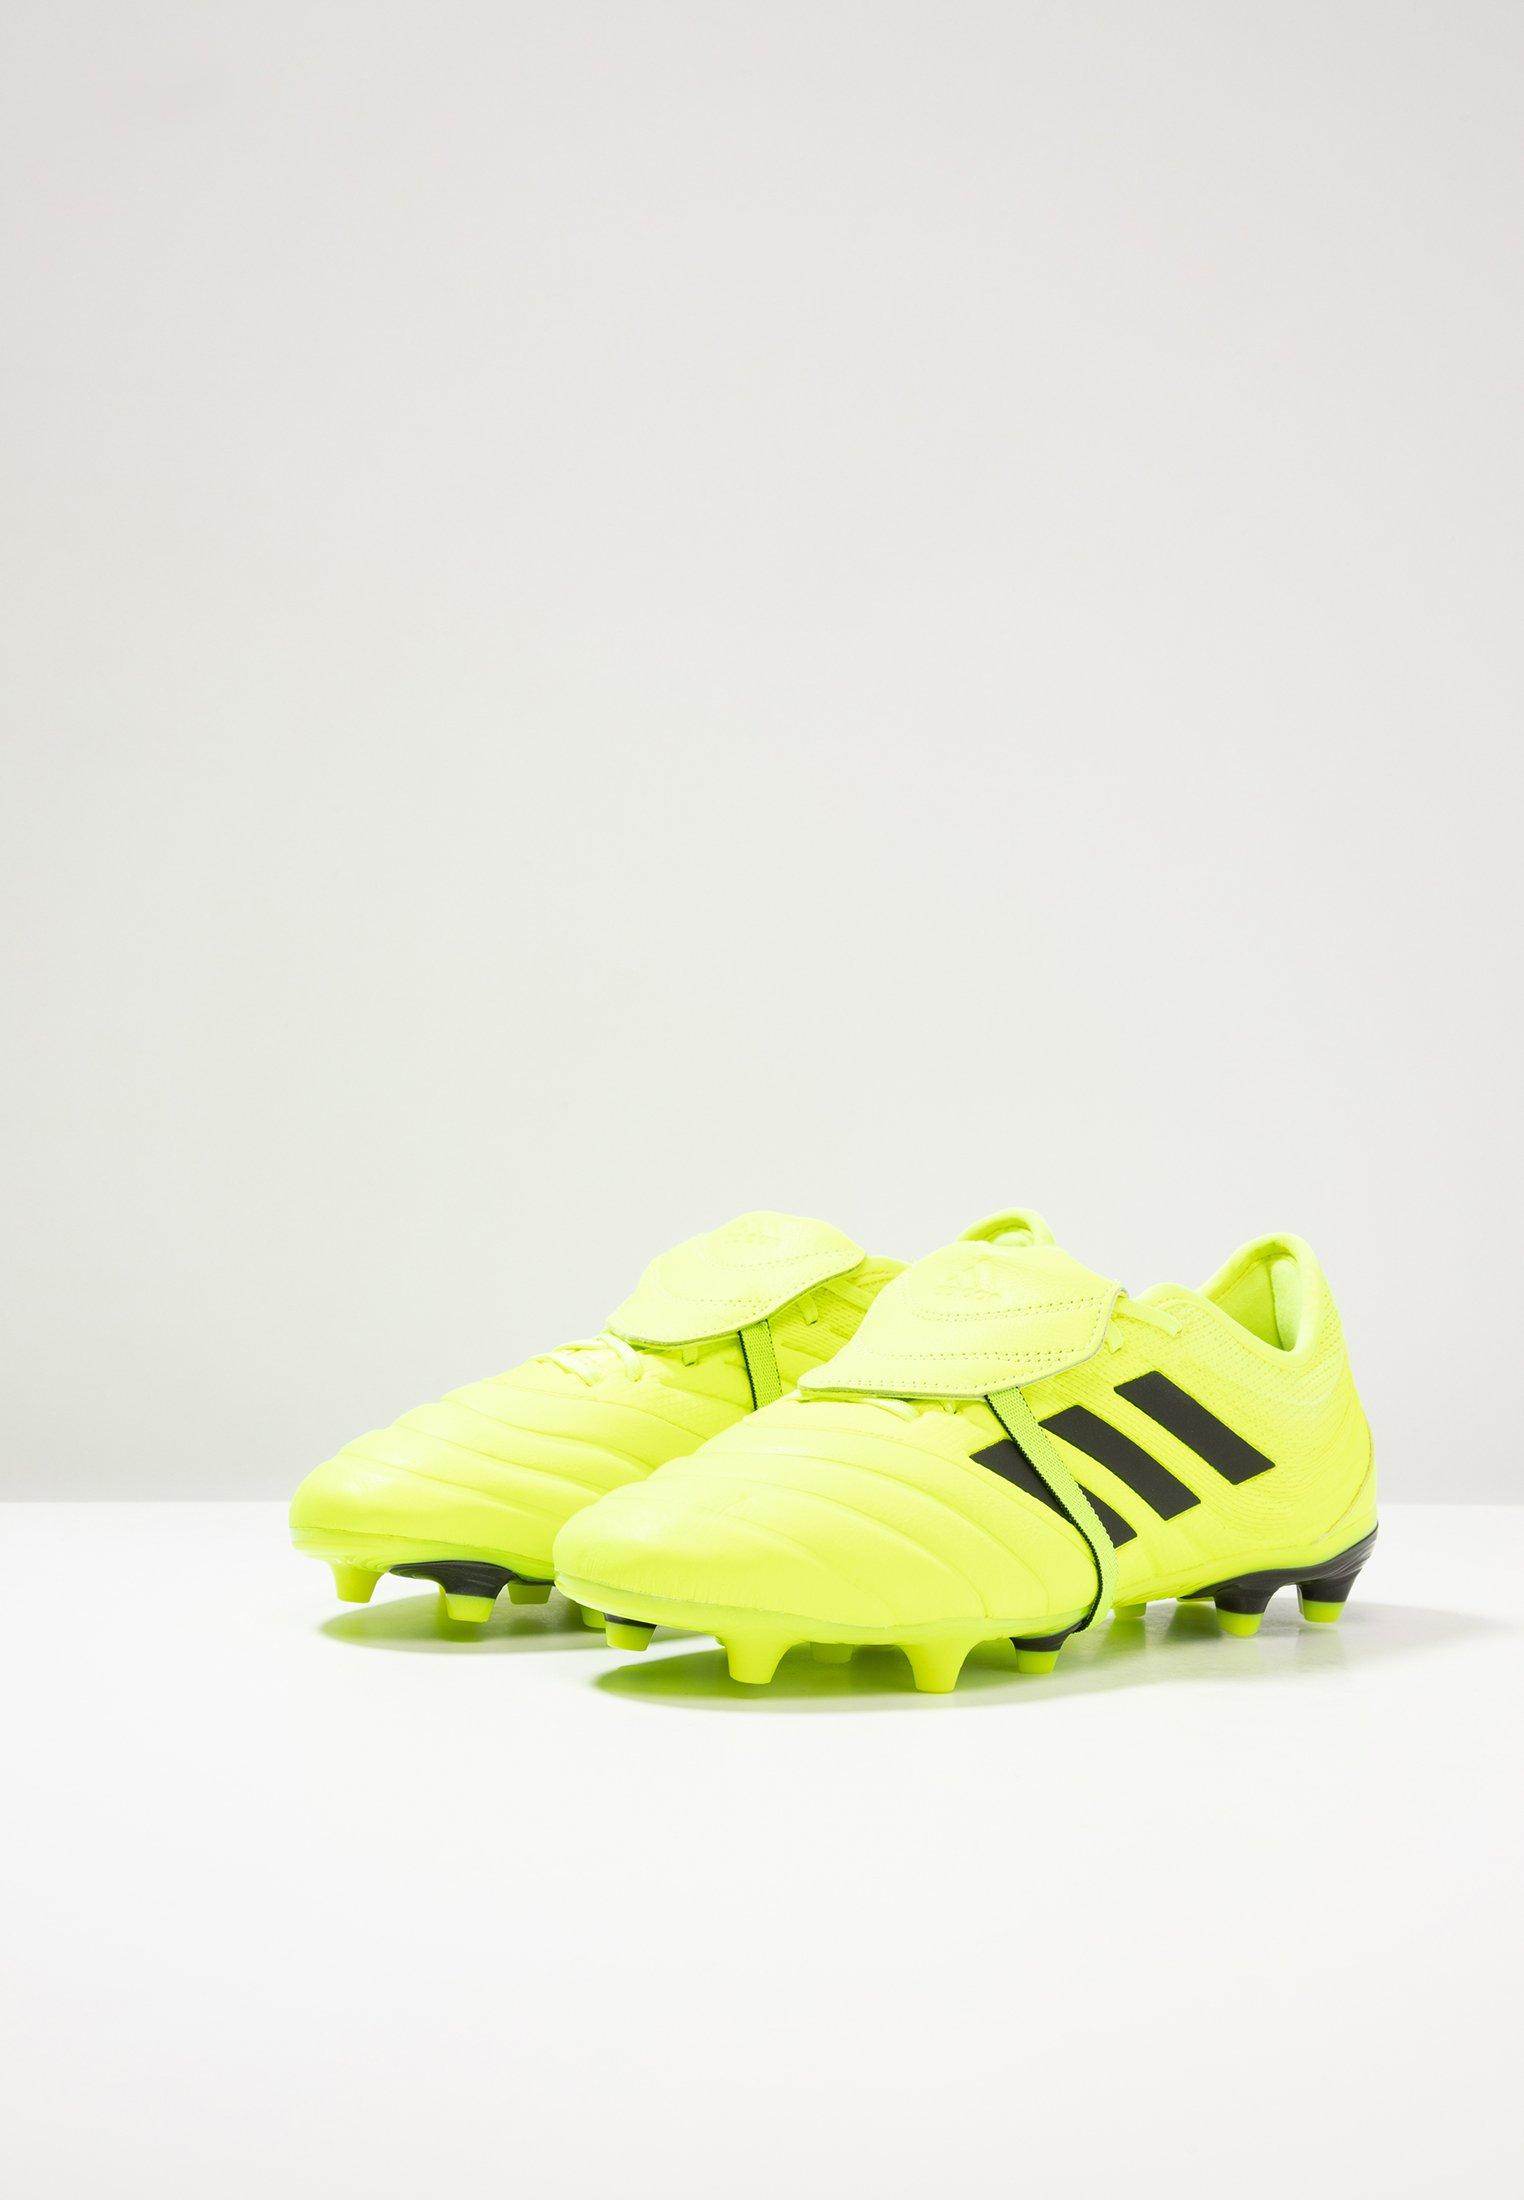 adidas Performance COPA GLORO 19.2 FG - Fußballschuh Nocken - solar yellow/core black/gelb - Herrenschuhe lU3Sw